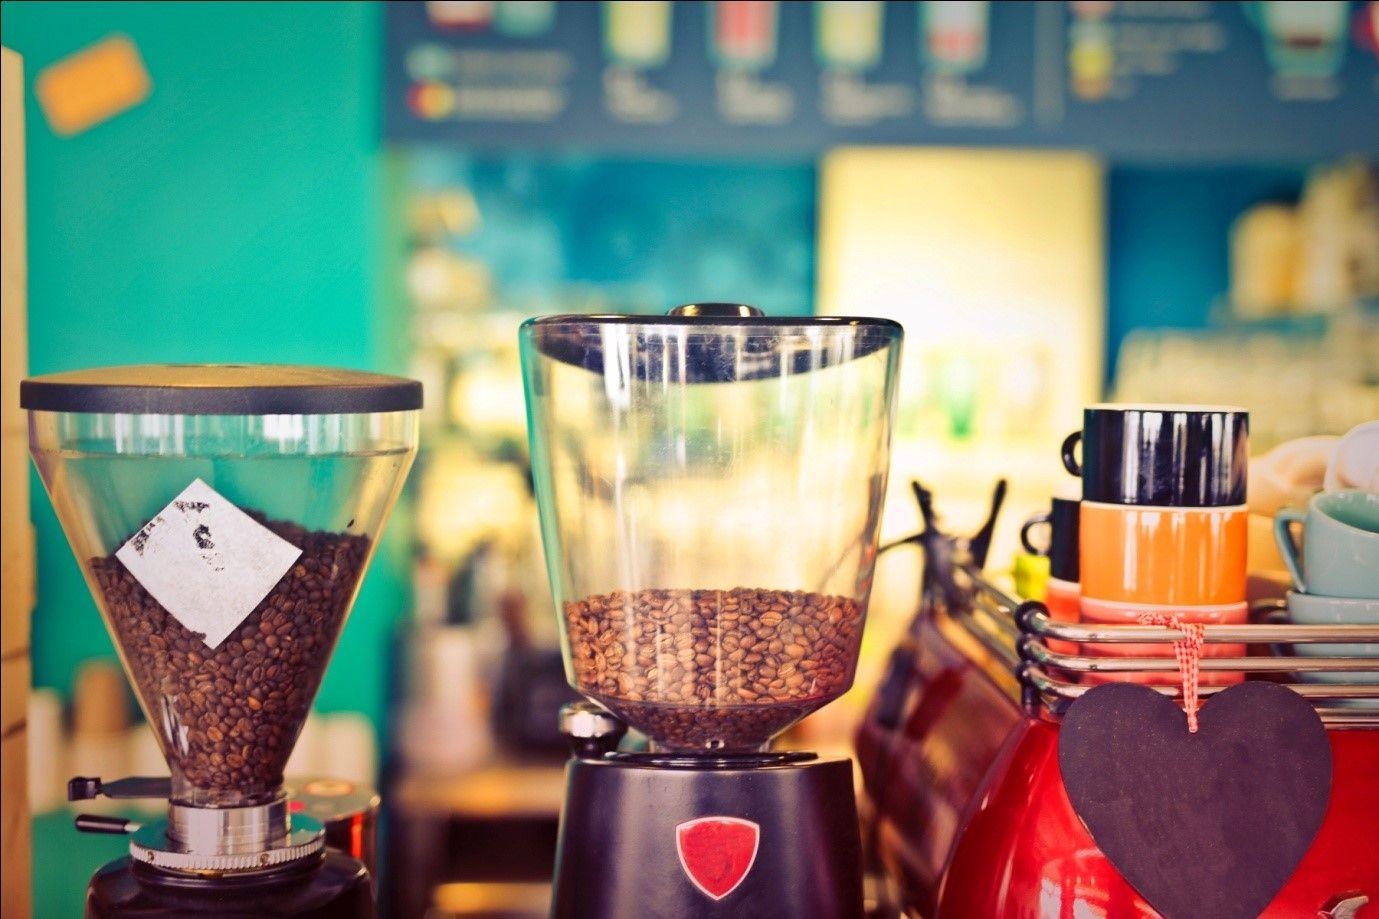 how to make macchiato without espresso machine